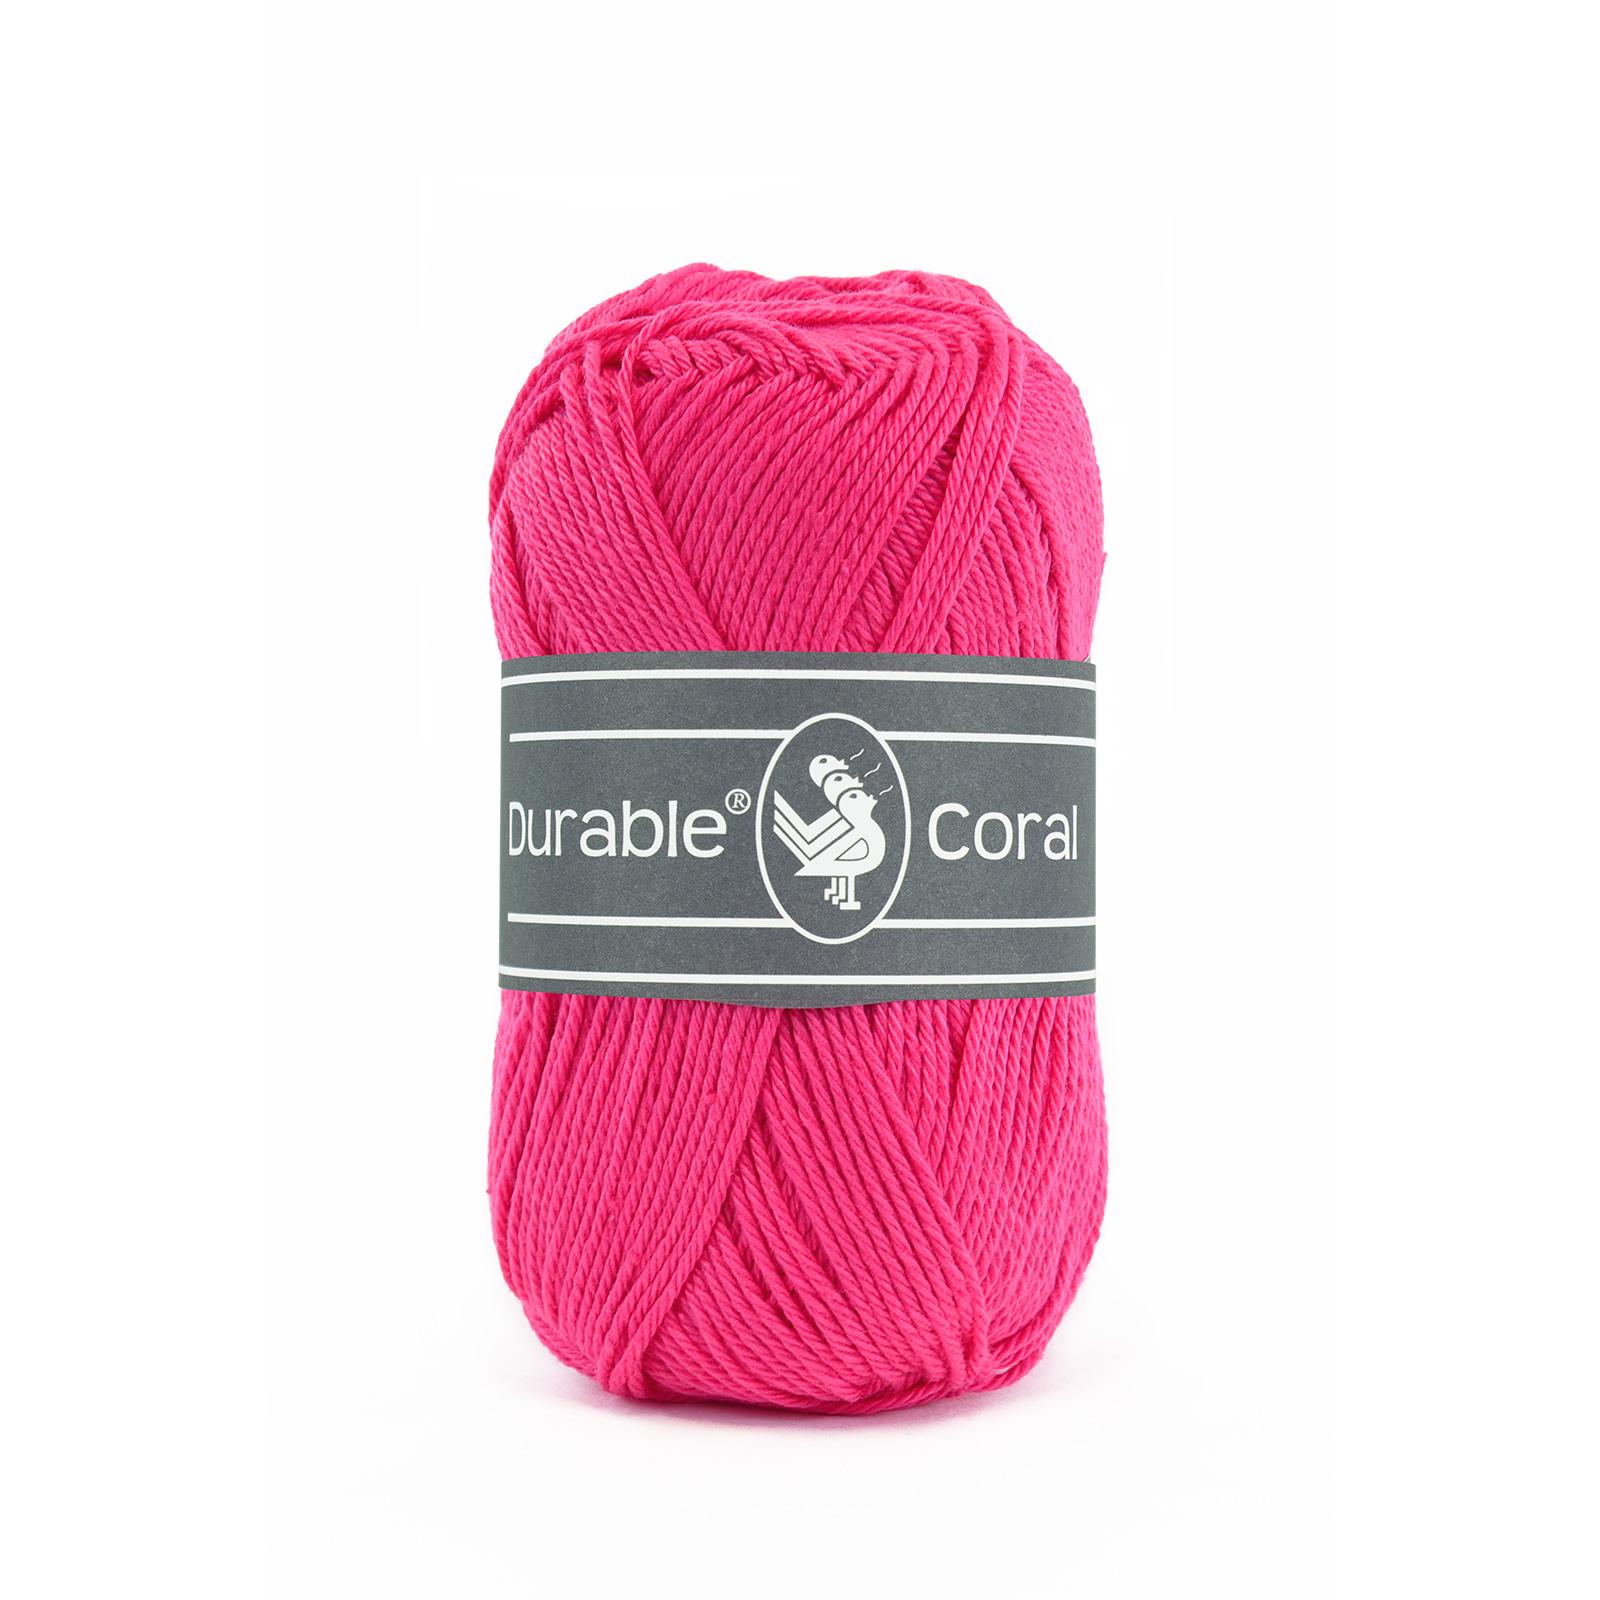 Durable Coral – 236 Fuchsia